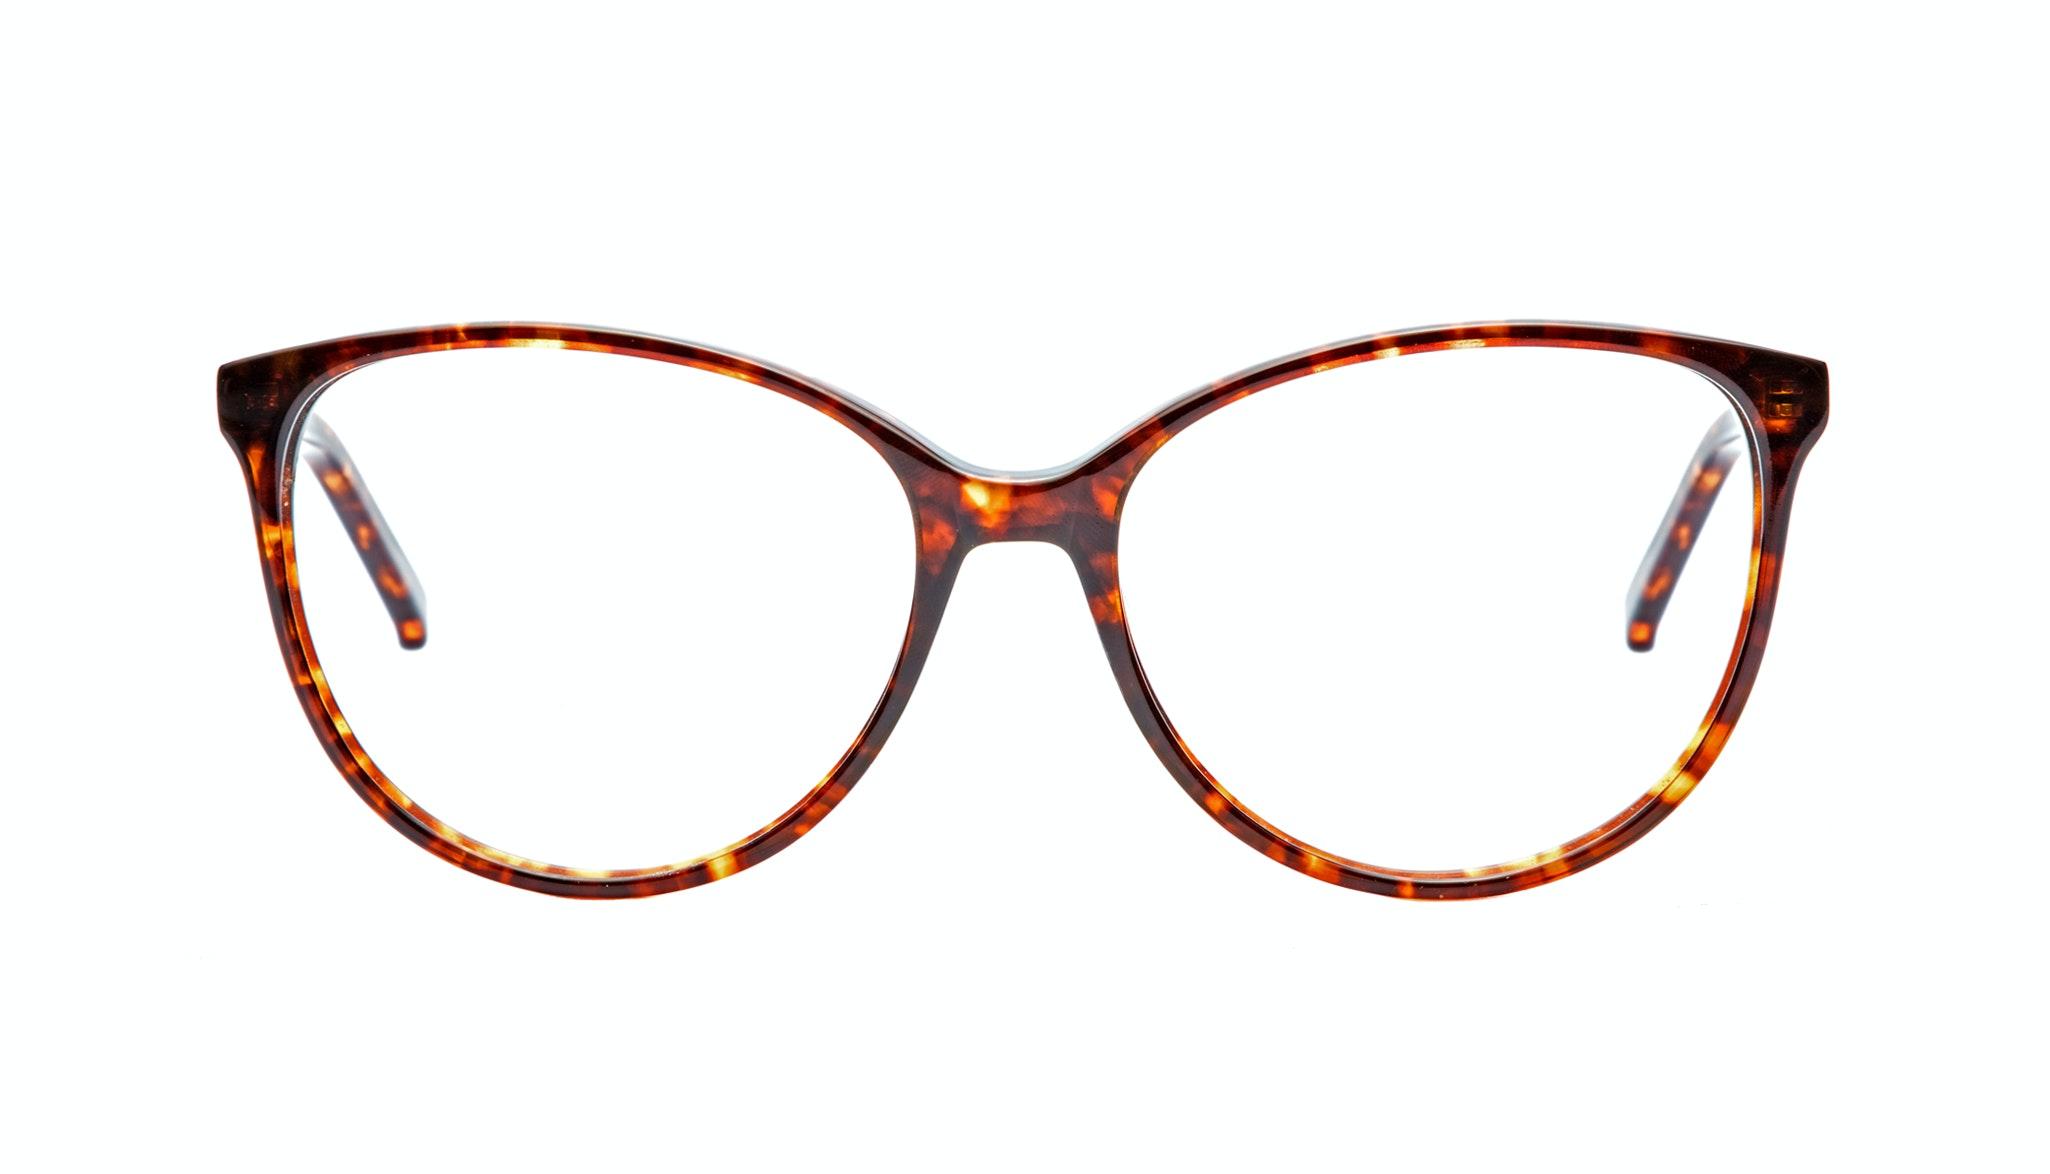 Affordable Fashion Glasses Round Eyeglasses Women Imagine Sepia Kiss Front